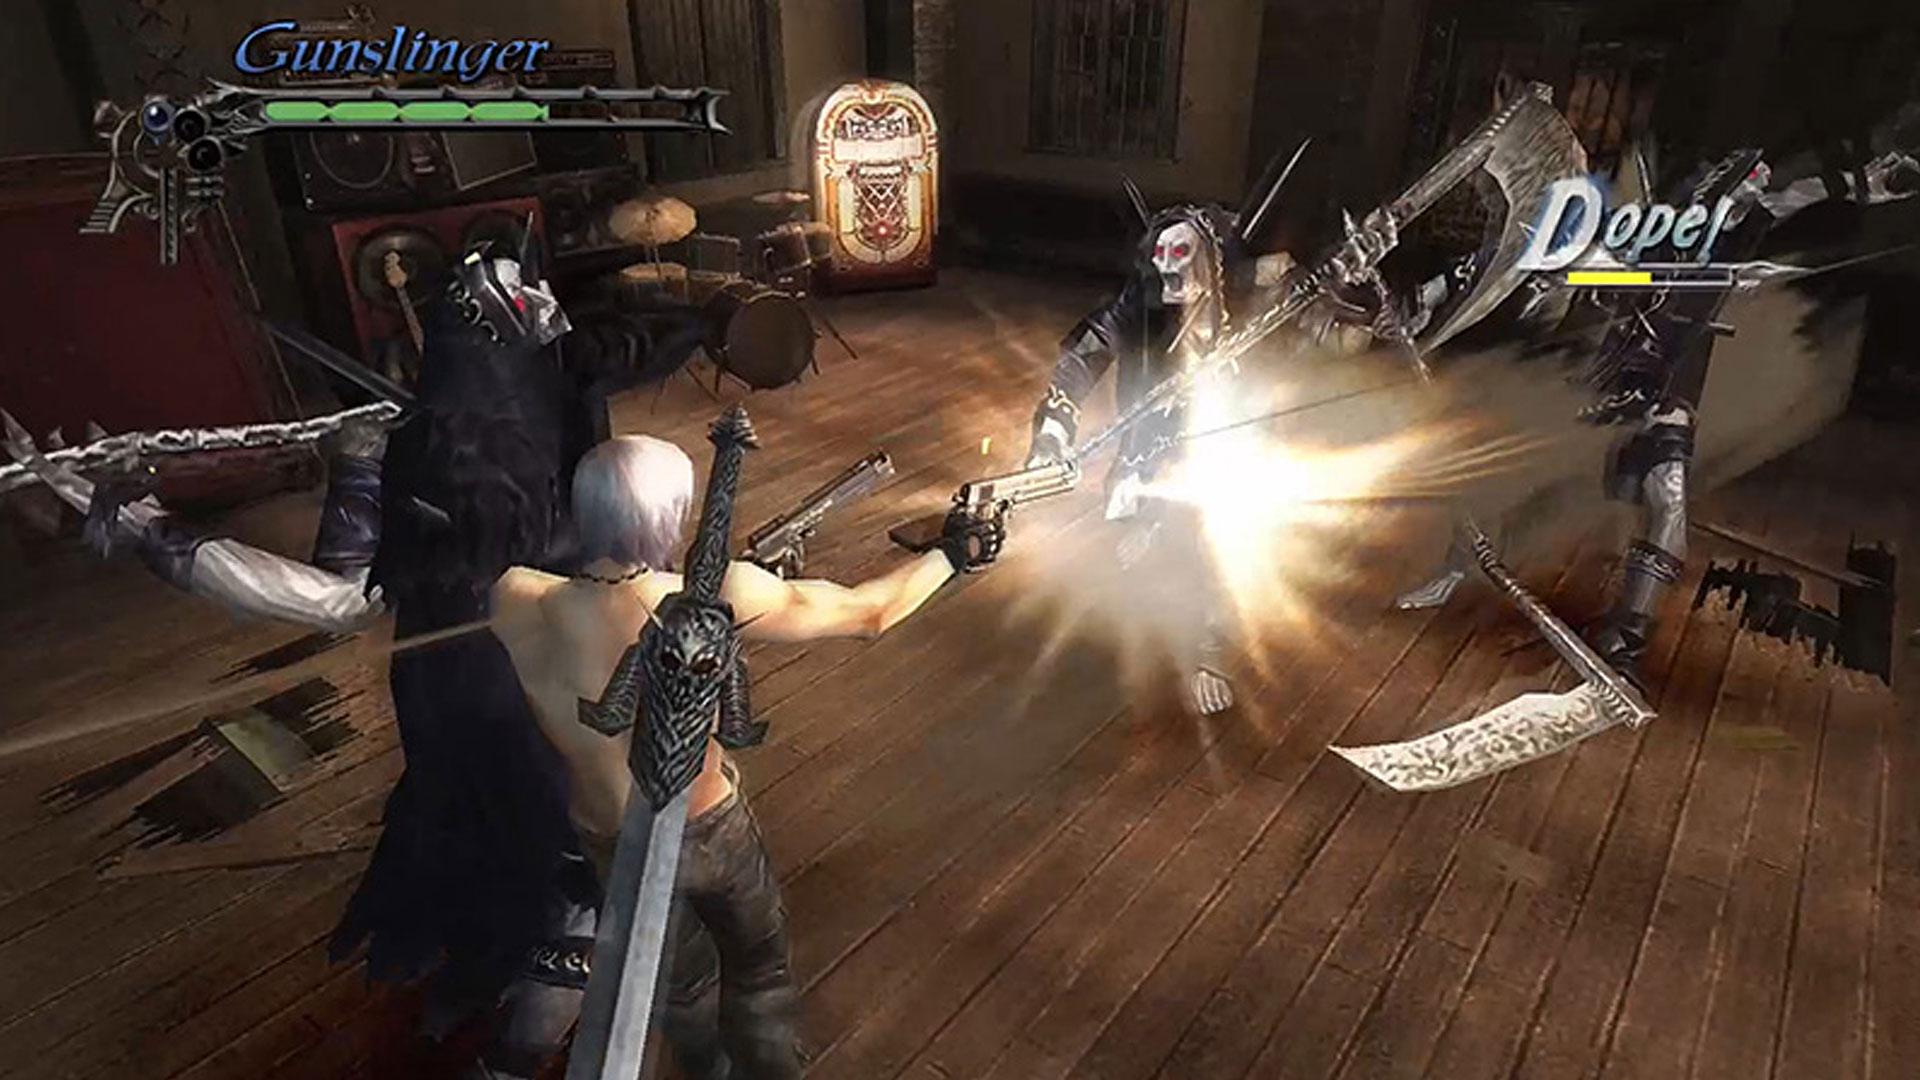 Quelle: Capcom - Devil May Cry 3 Special Edition